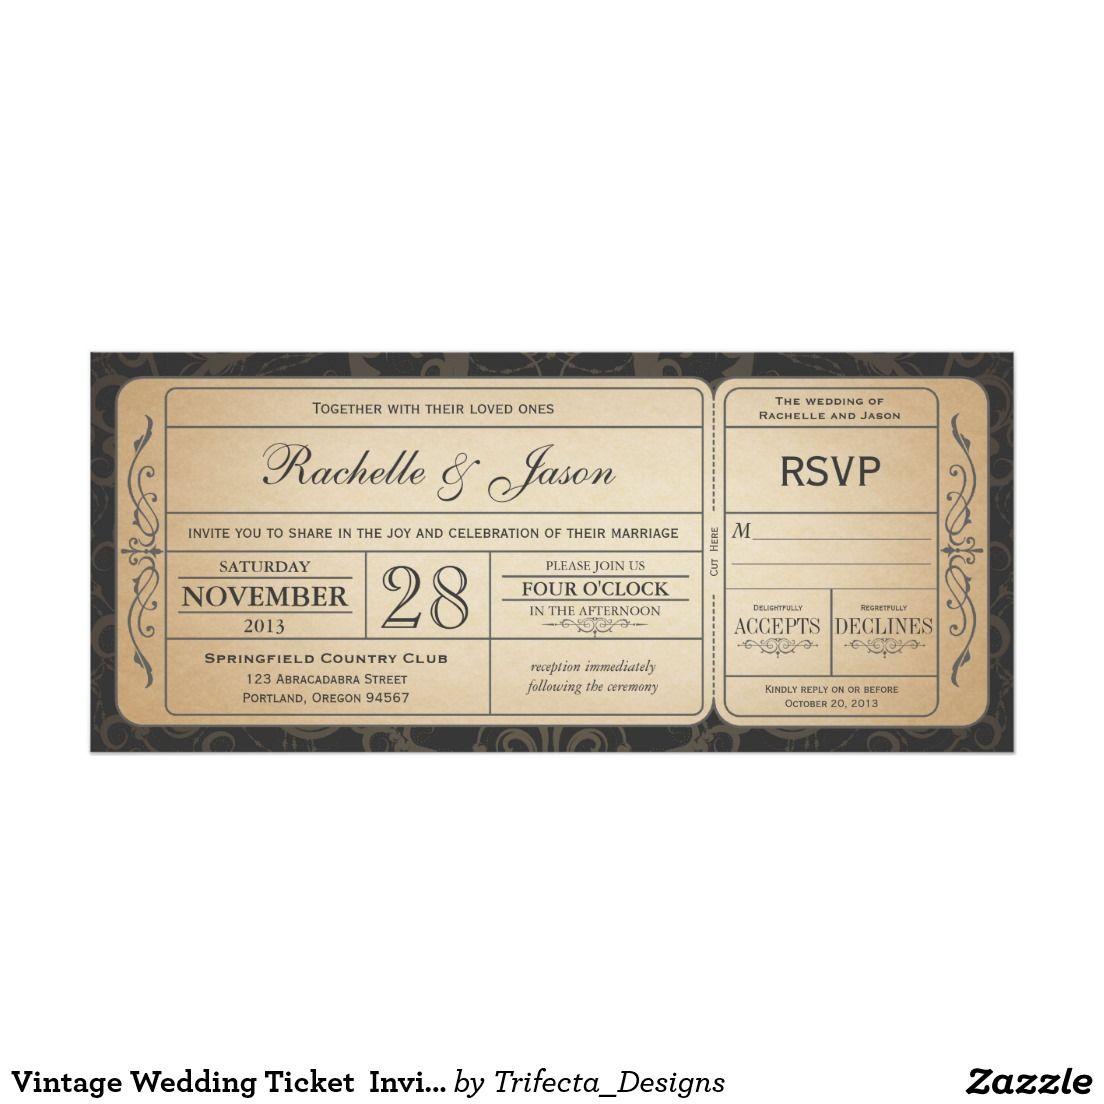 Vintage Wedding Ticket Invitation with RSVP 3.0 Vintage Wedding ...